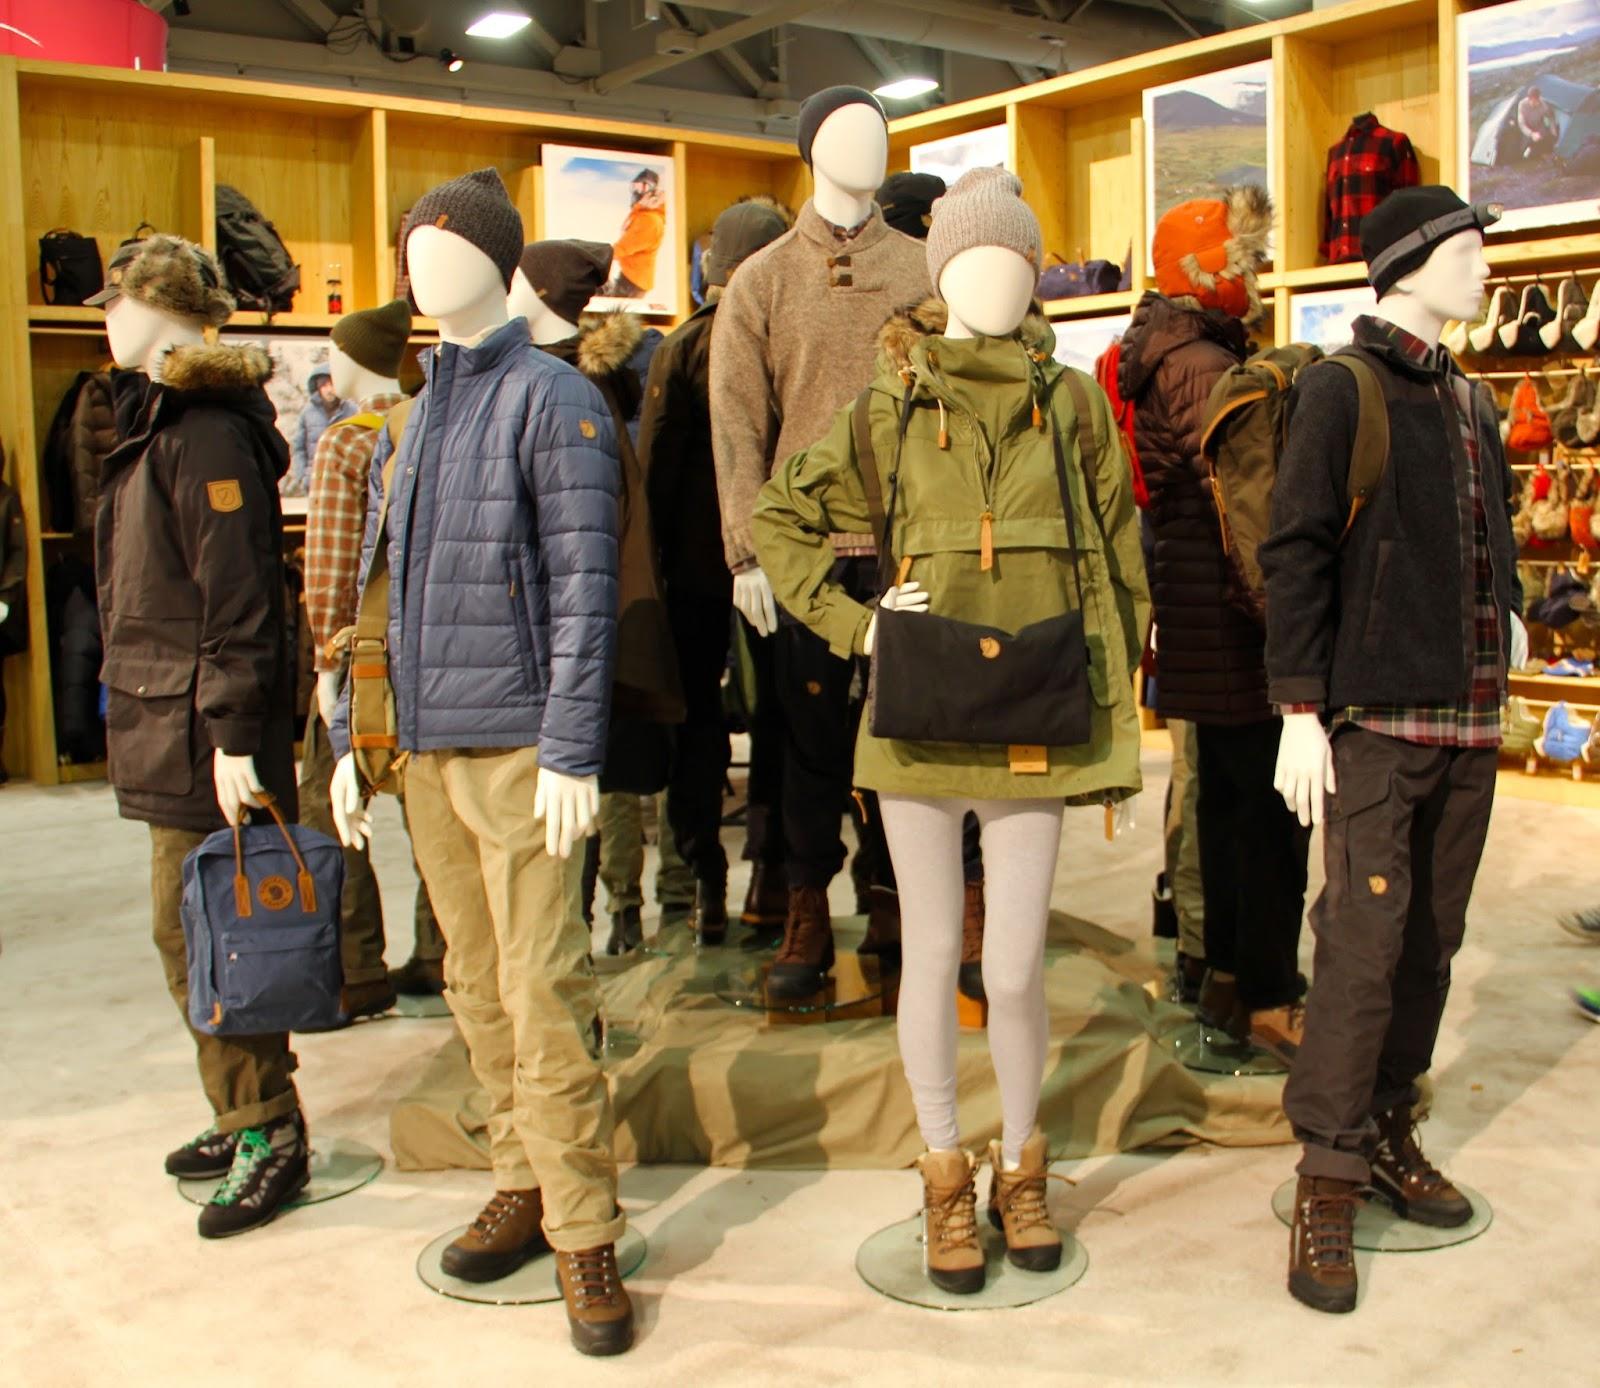 Fj 196 Llr 196 Ven Fall 2014 Apparel Outerwear Men S Women S